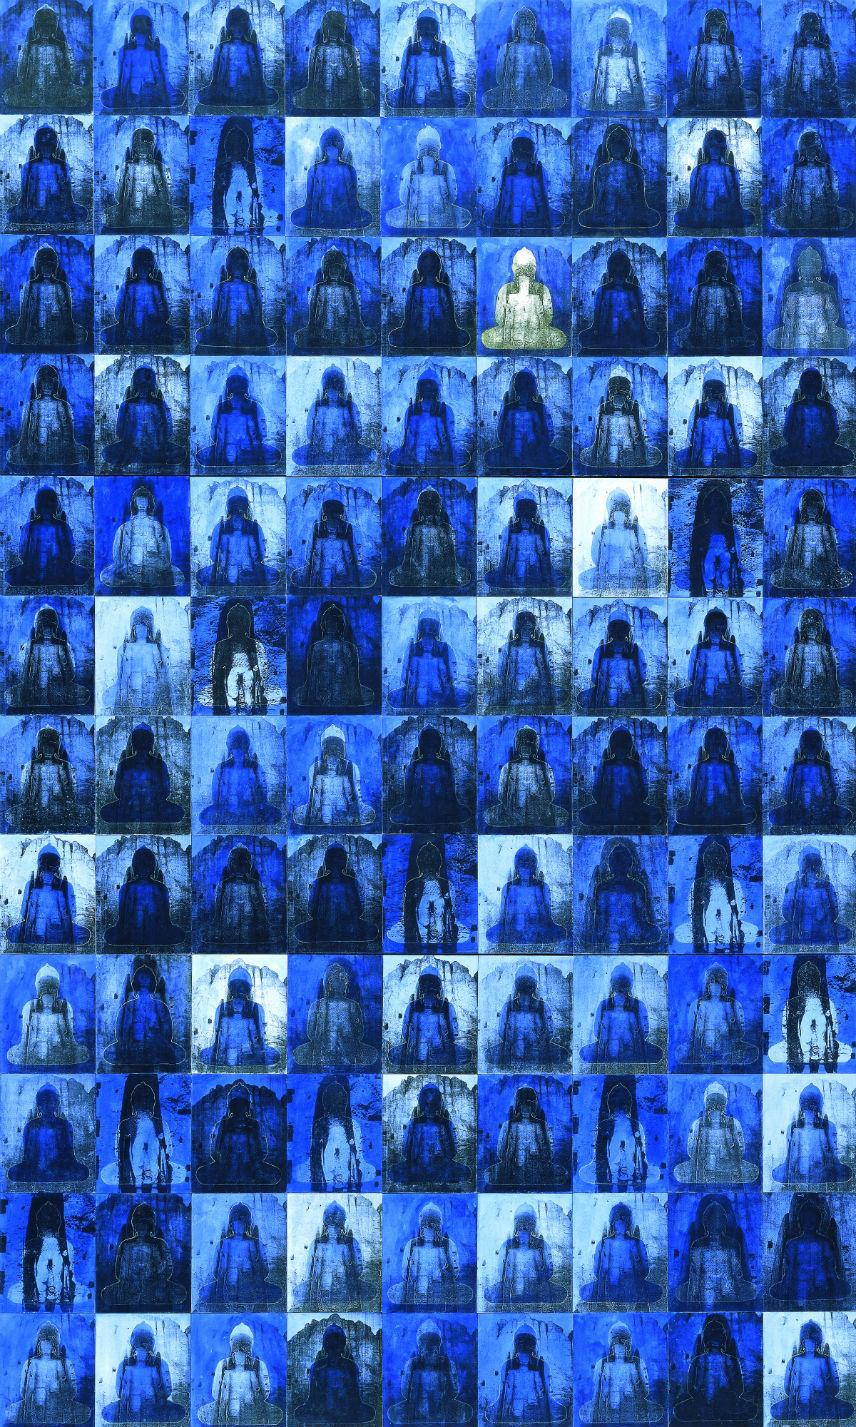 blue buddhas